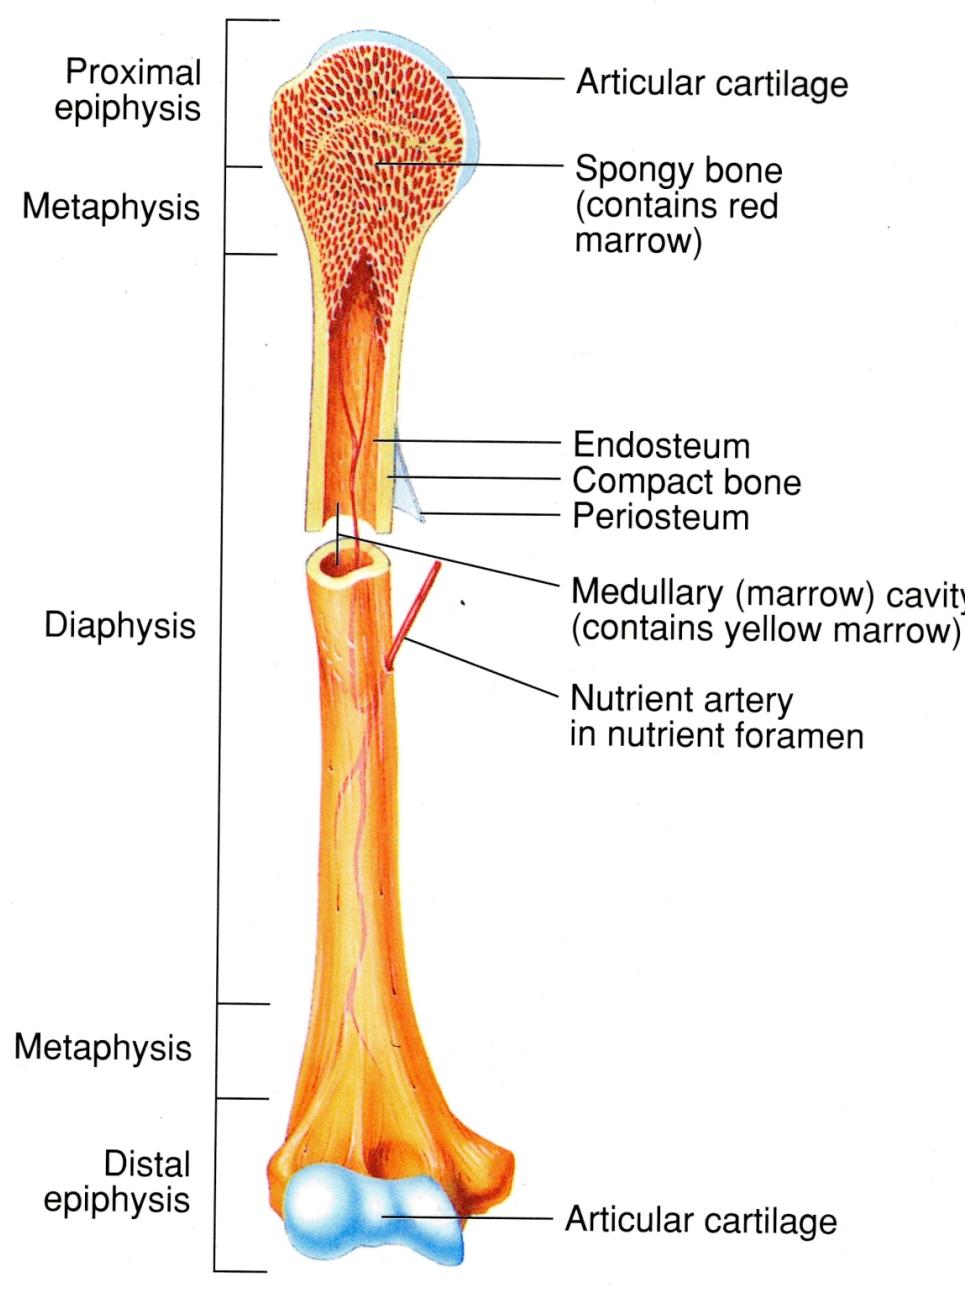 Anatomy Of A Long Bone Bone Growth Human Body Anatomy Skeletal